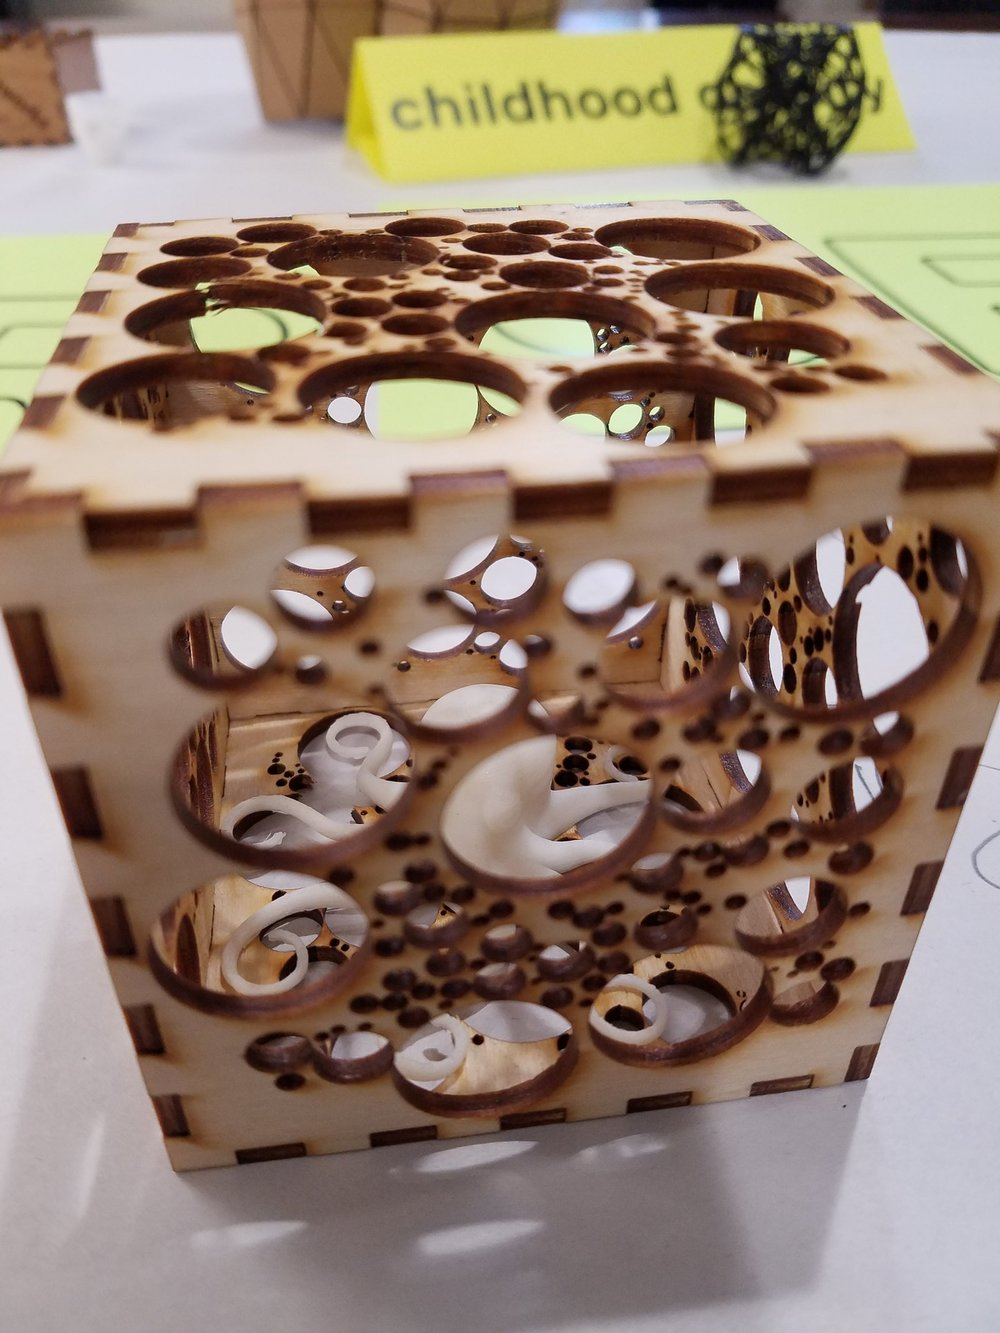 octopus in box.jpg